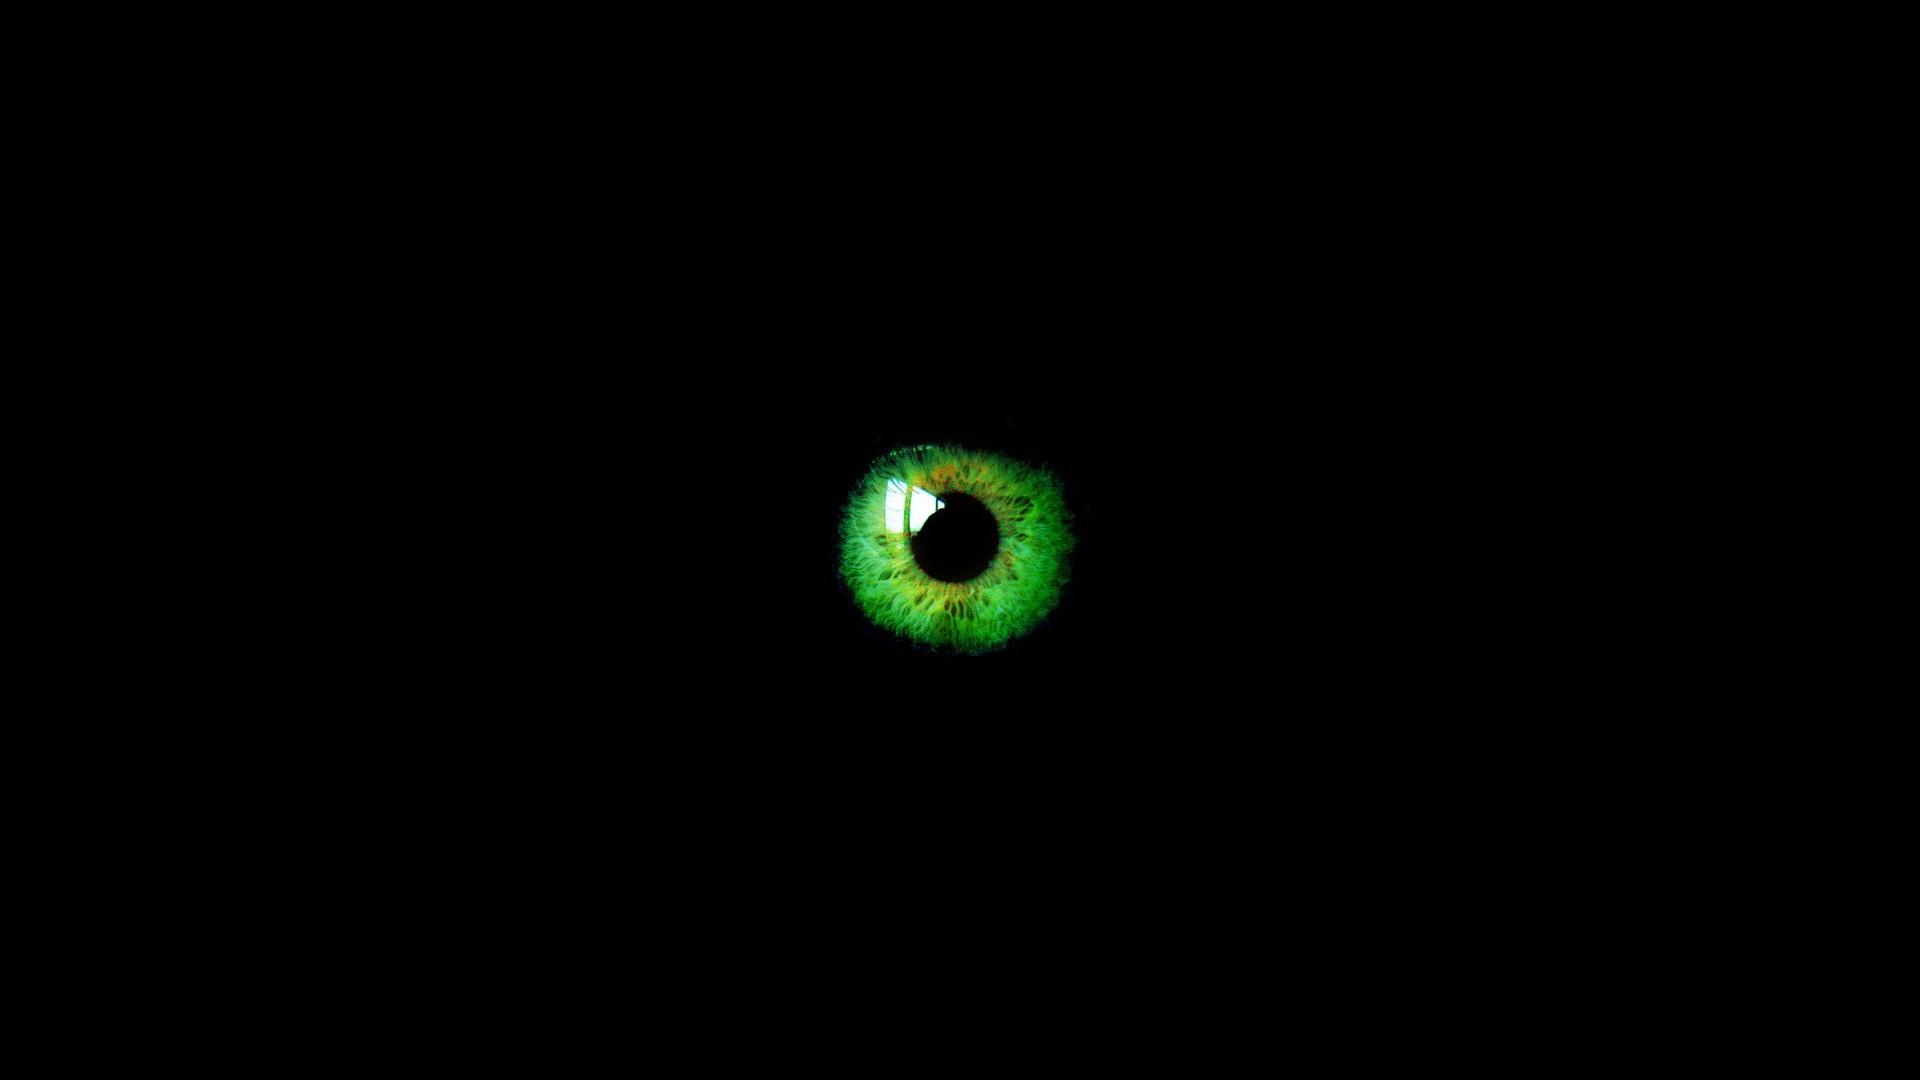 Green Abstract Wallpaper 1920x1080 Green Abstract Eyes Black 1920x1080